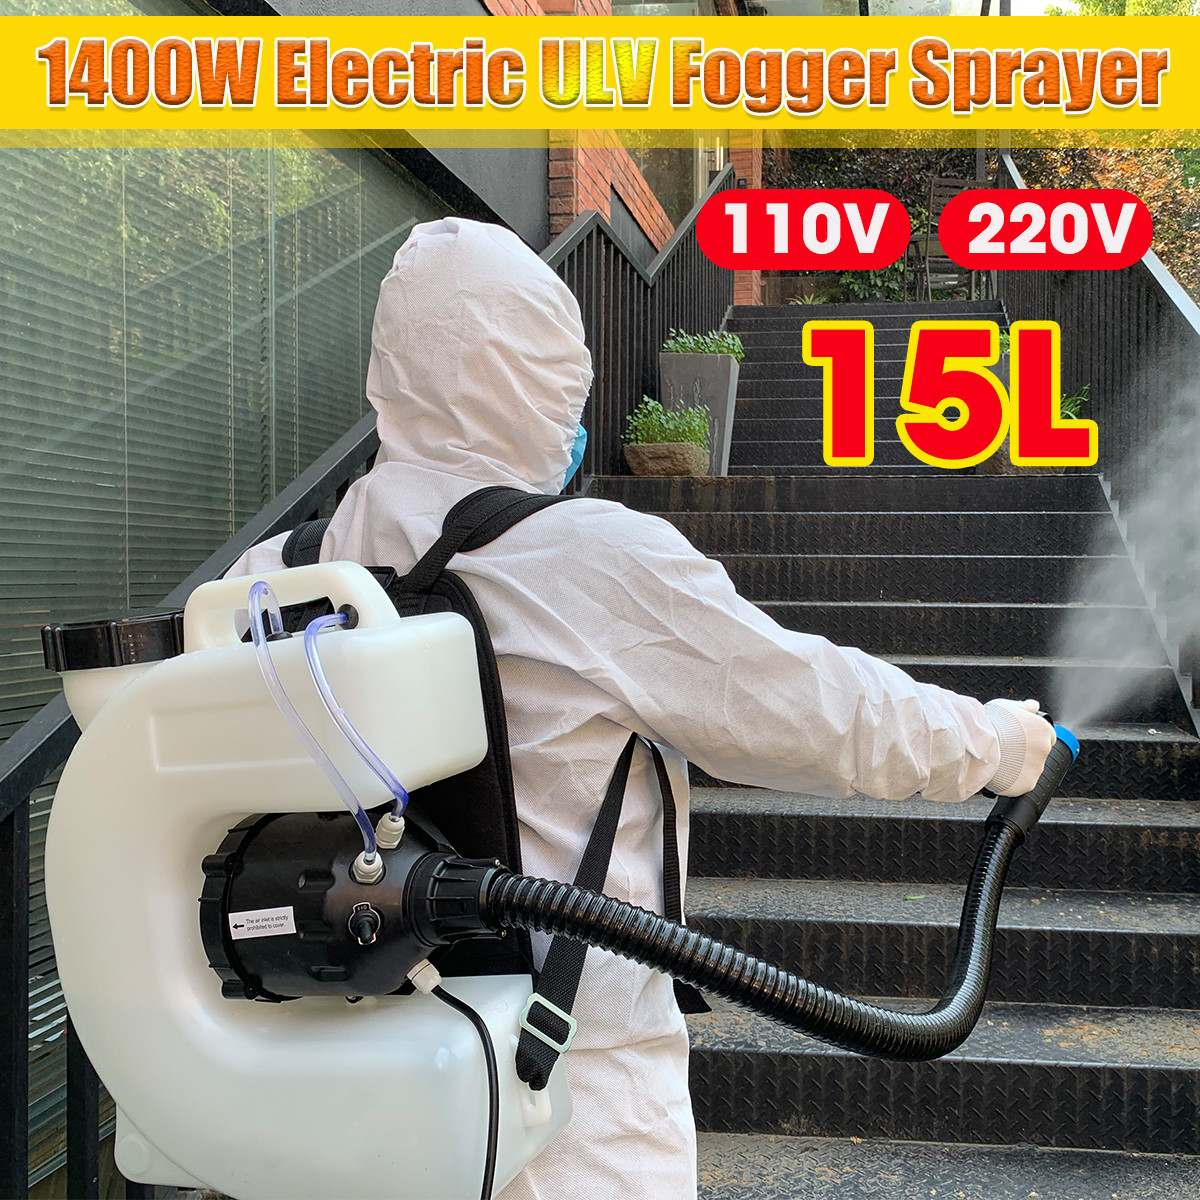 110V/220V Electric ULV Fogger ULV Ultra Low Capacity Cold Fogging Machine 1400W Knapsack Electric Spray Disinfection Machine 15L